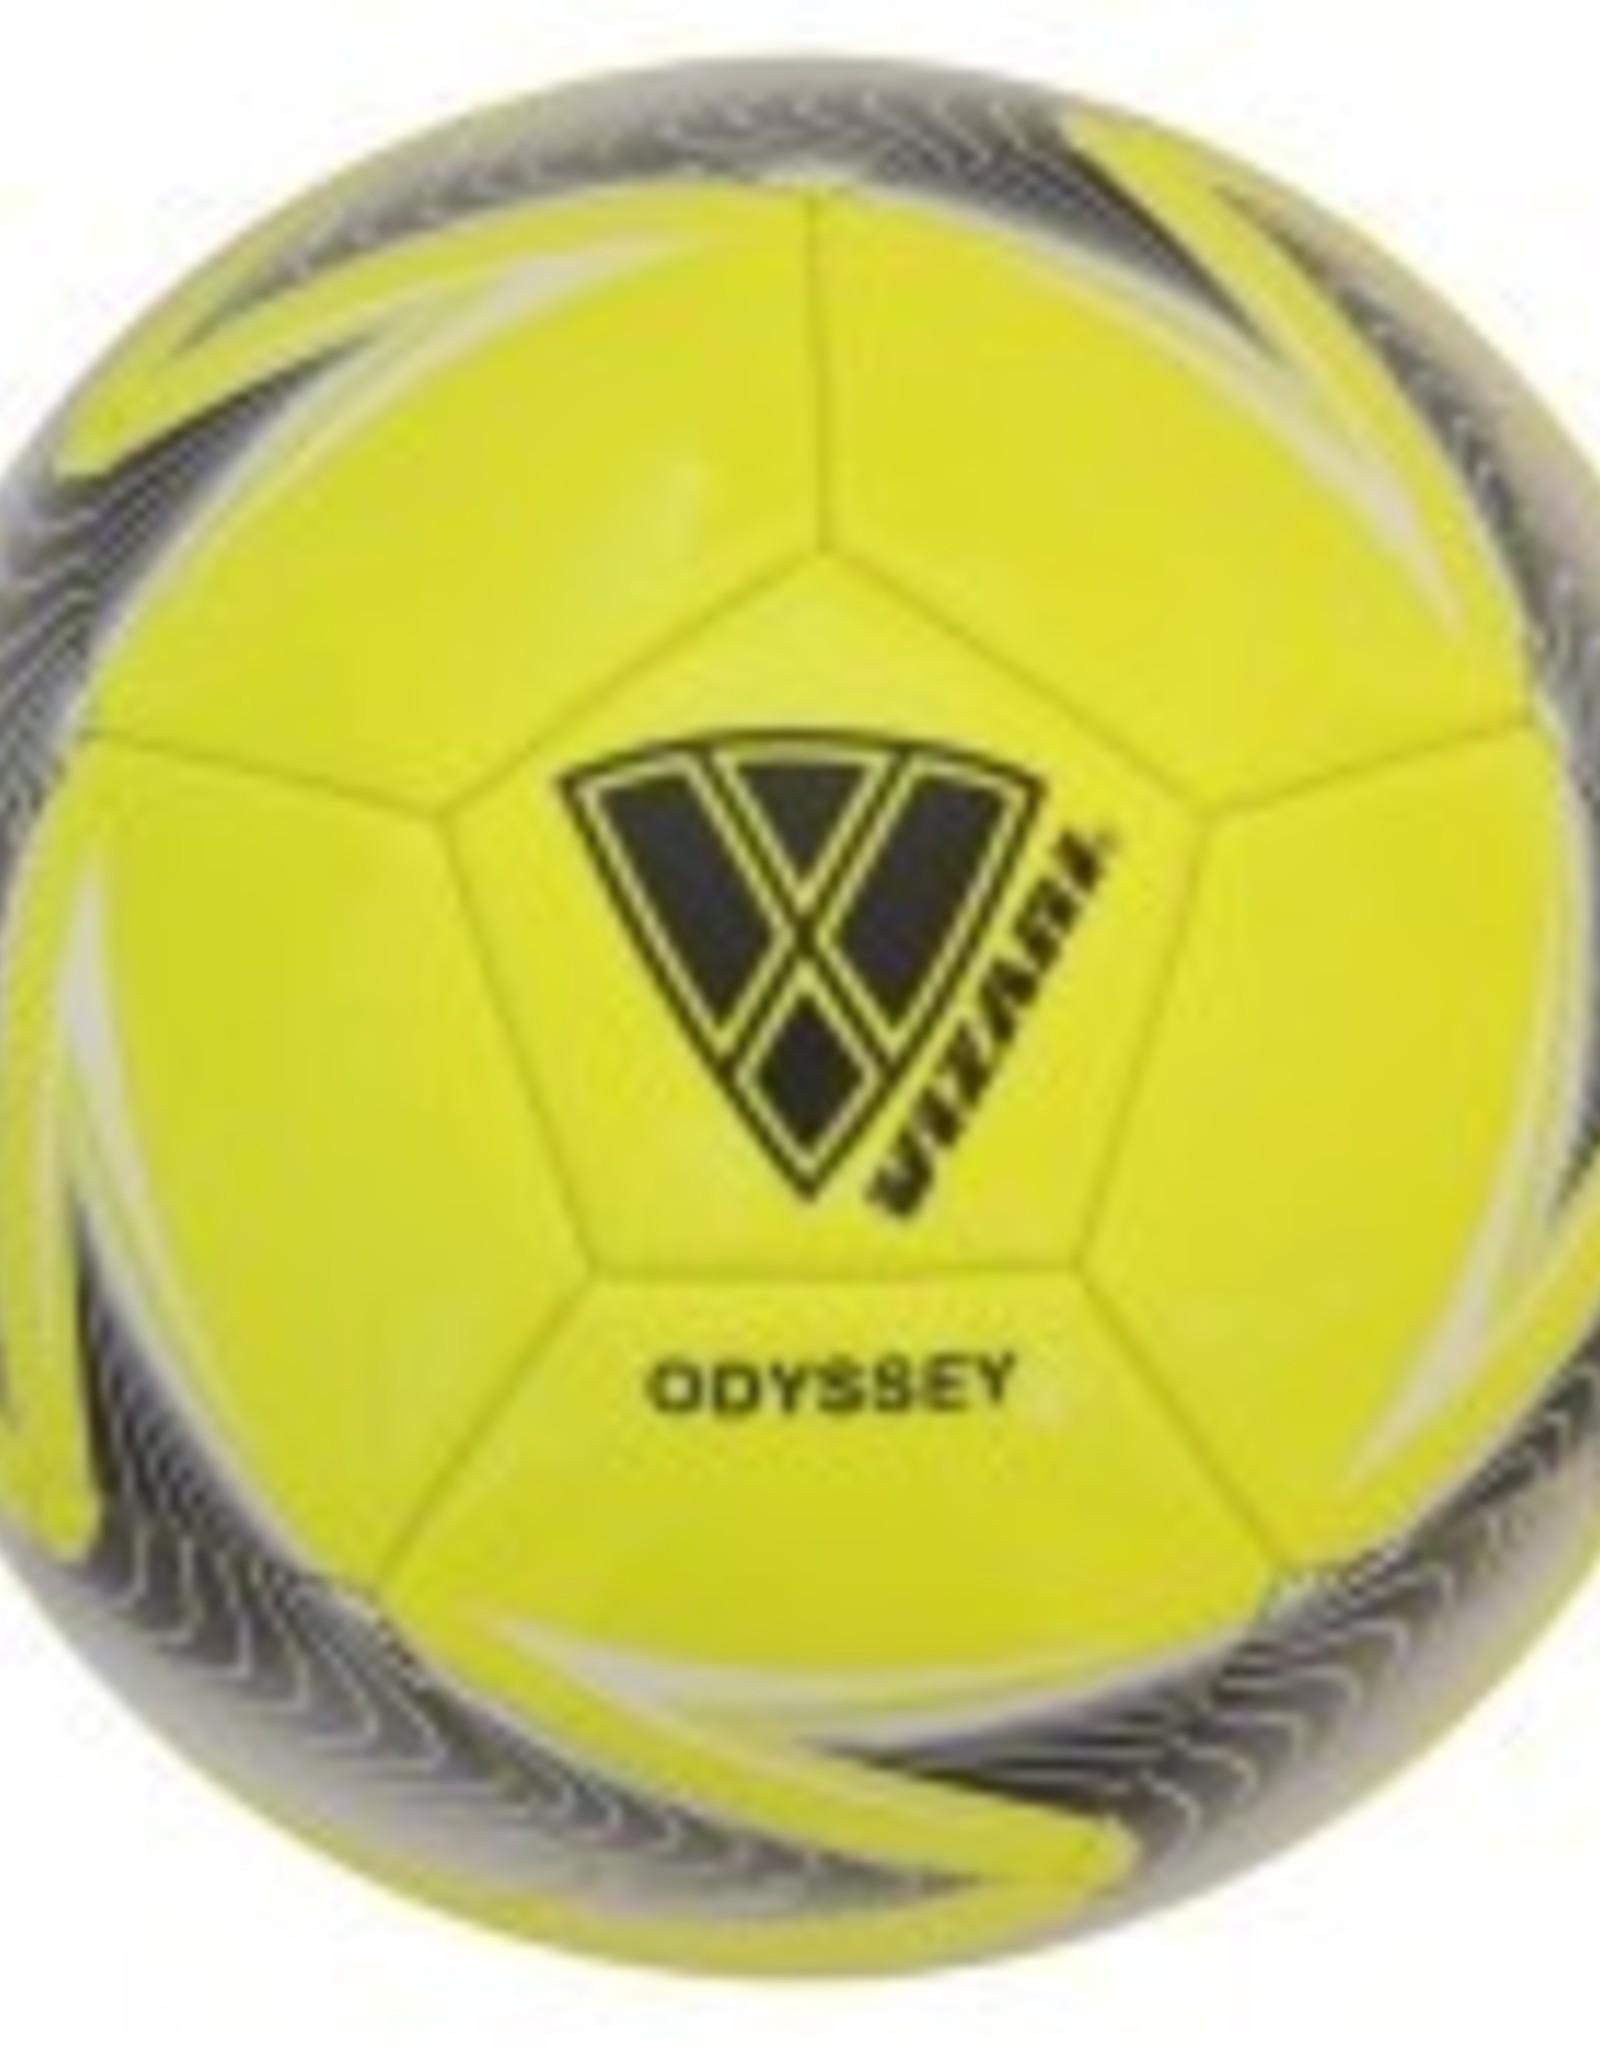 Odyssey Soccer Ball